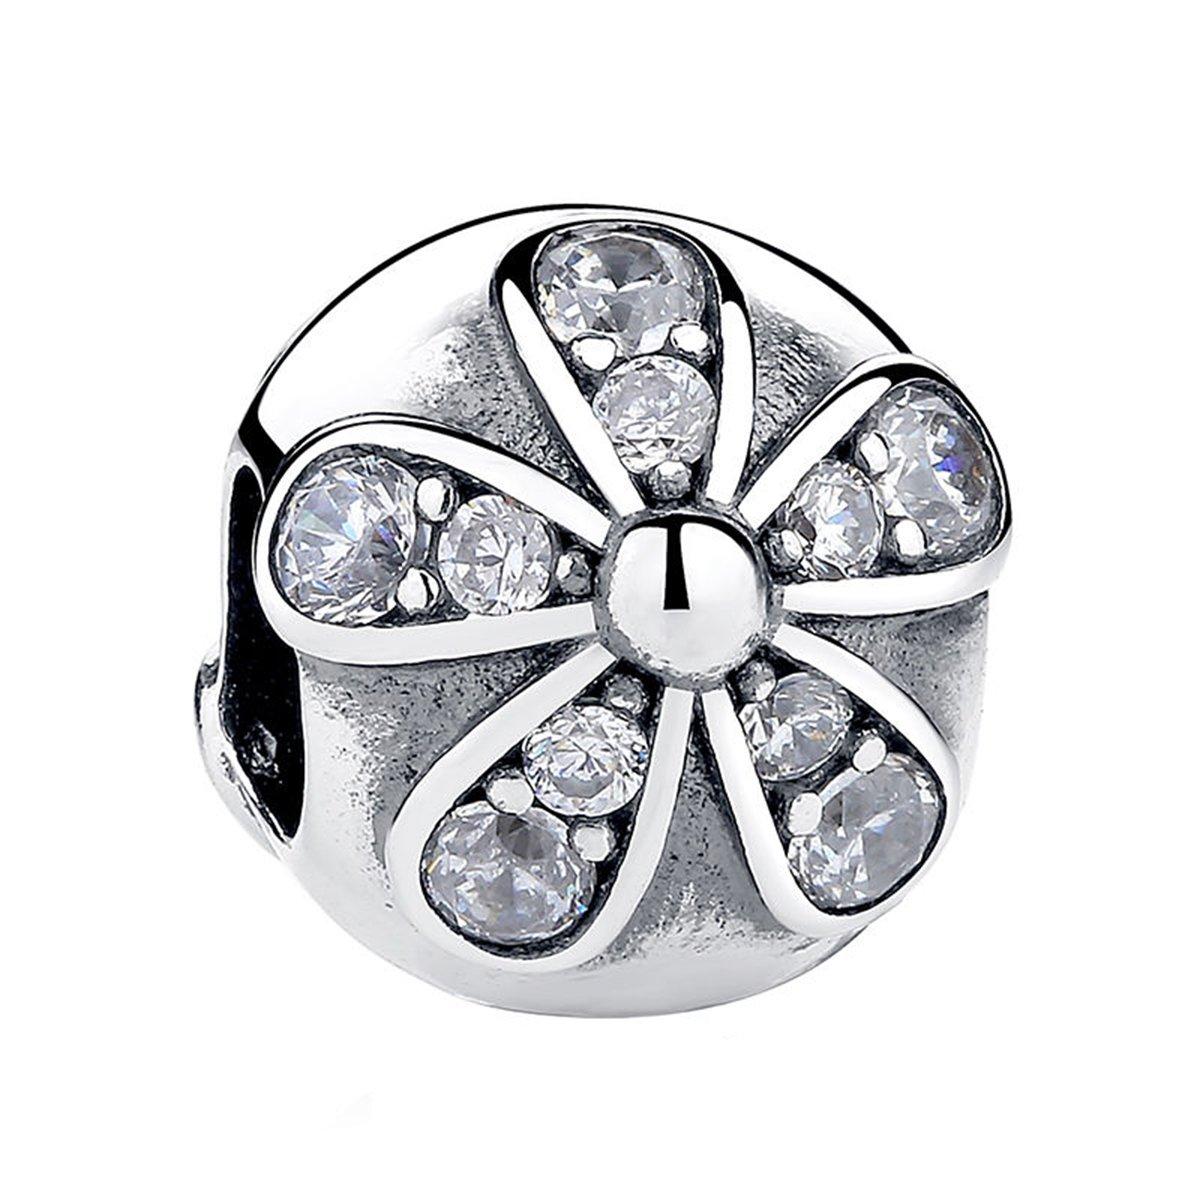 Generic 2018 New Charms Beads Bracelet